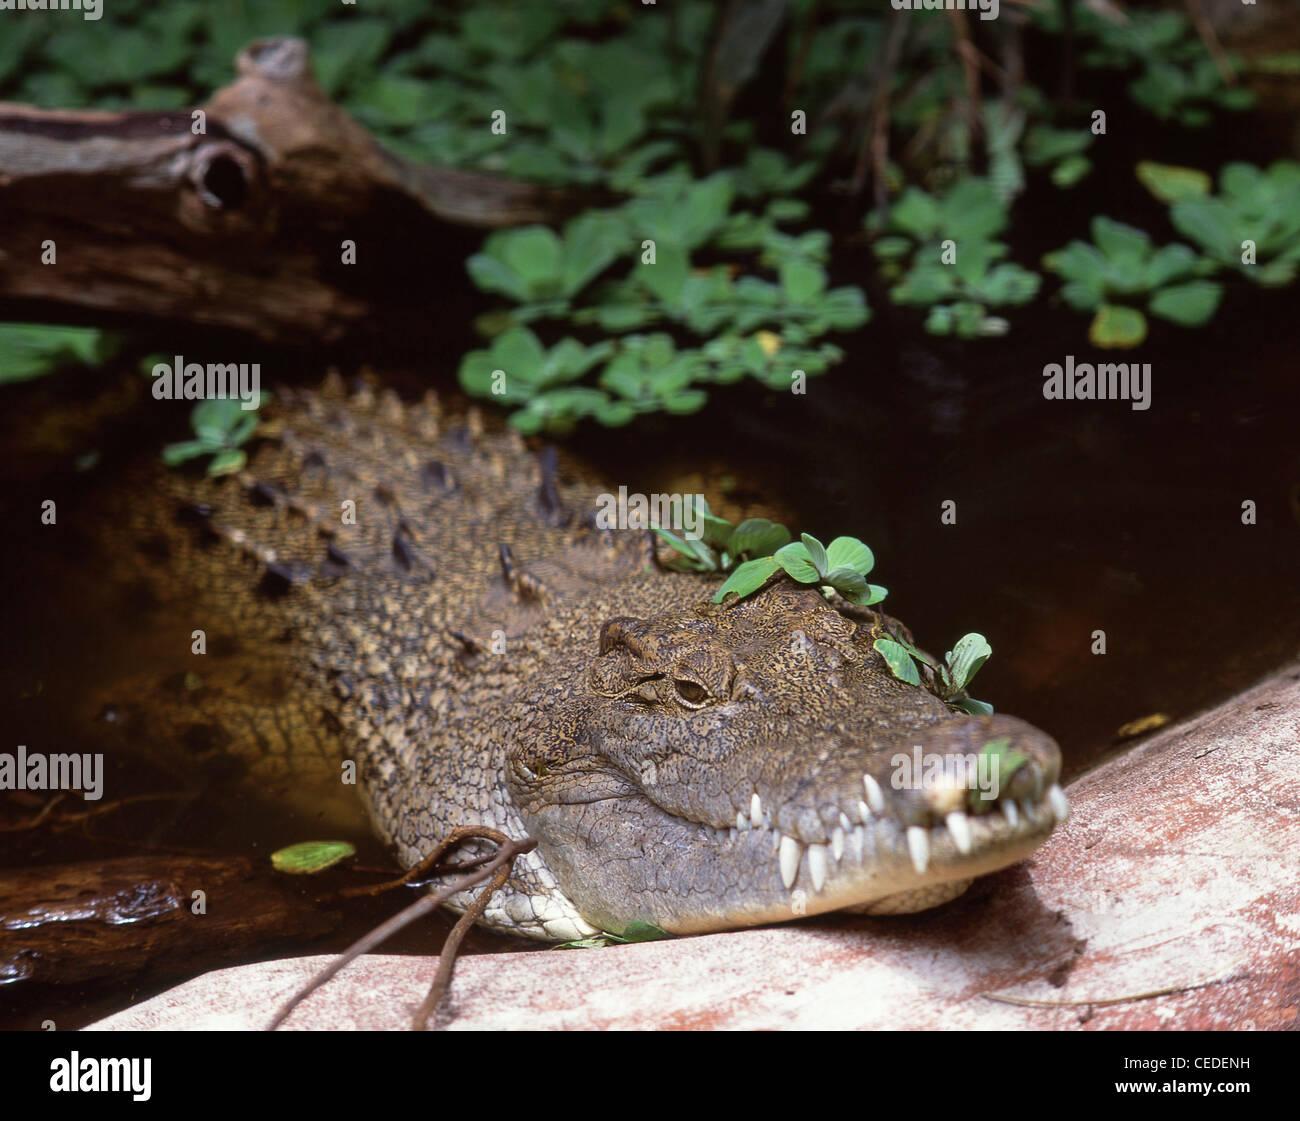 Crocodile resting, Green Island, Great Barrier Reef Marine Park, Queensland, Australia Stock Photo